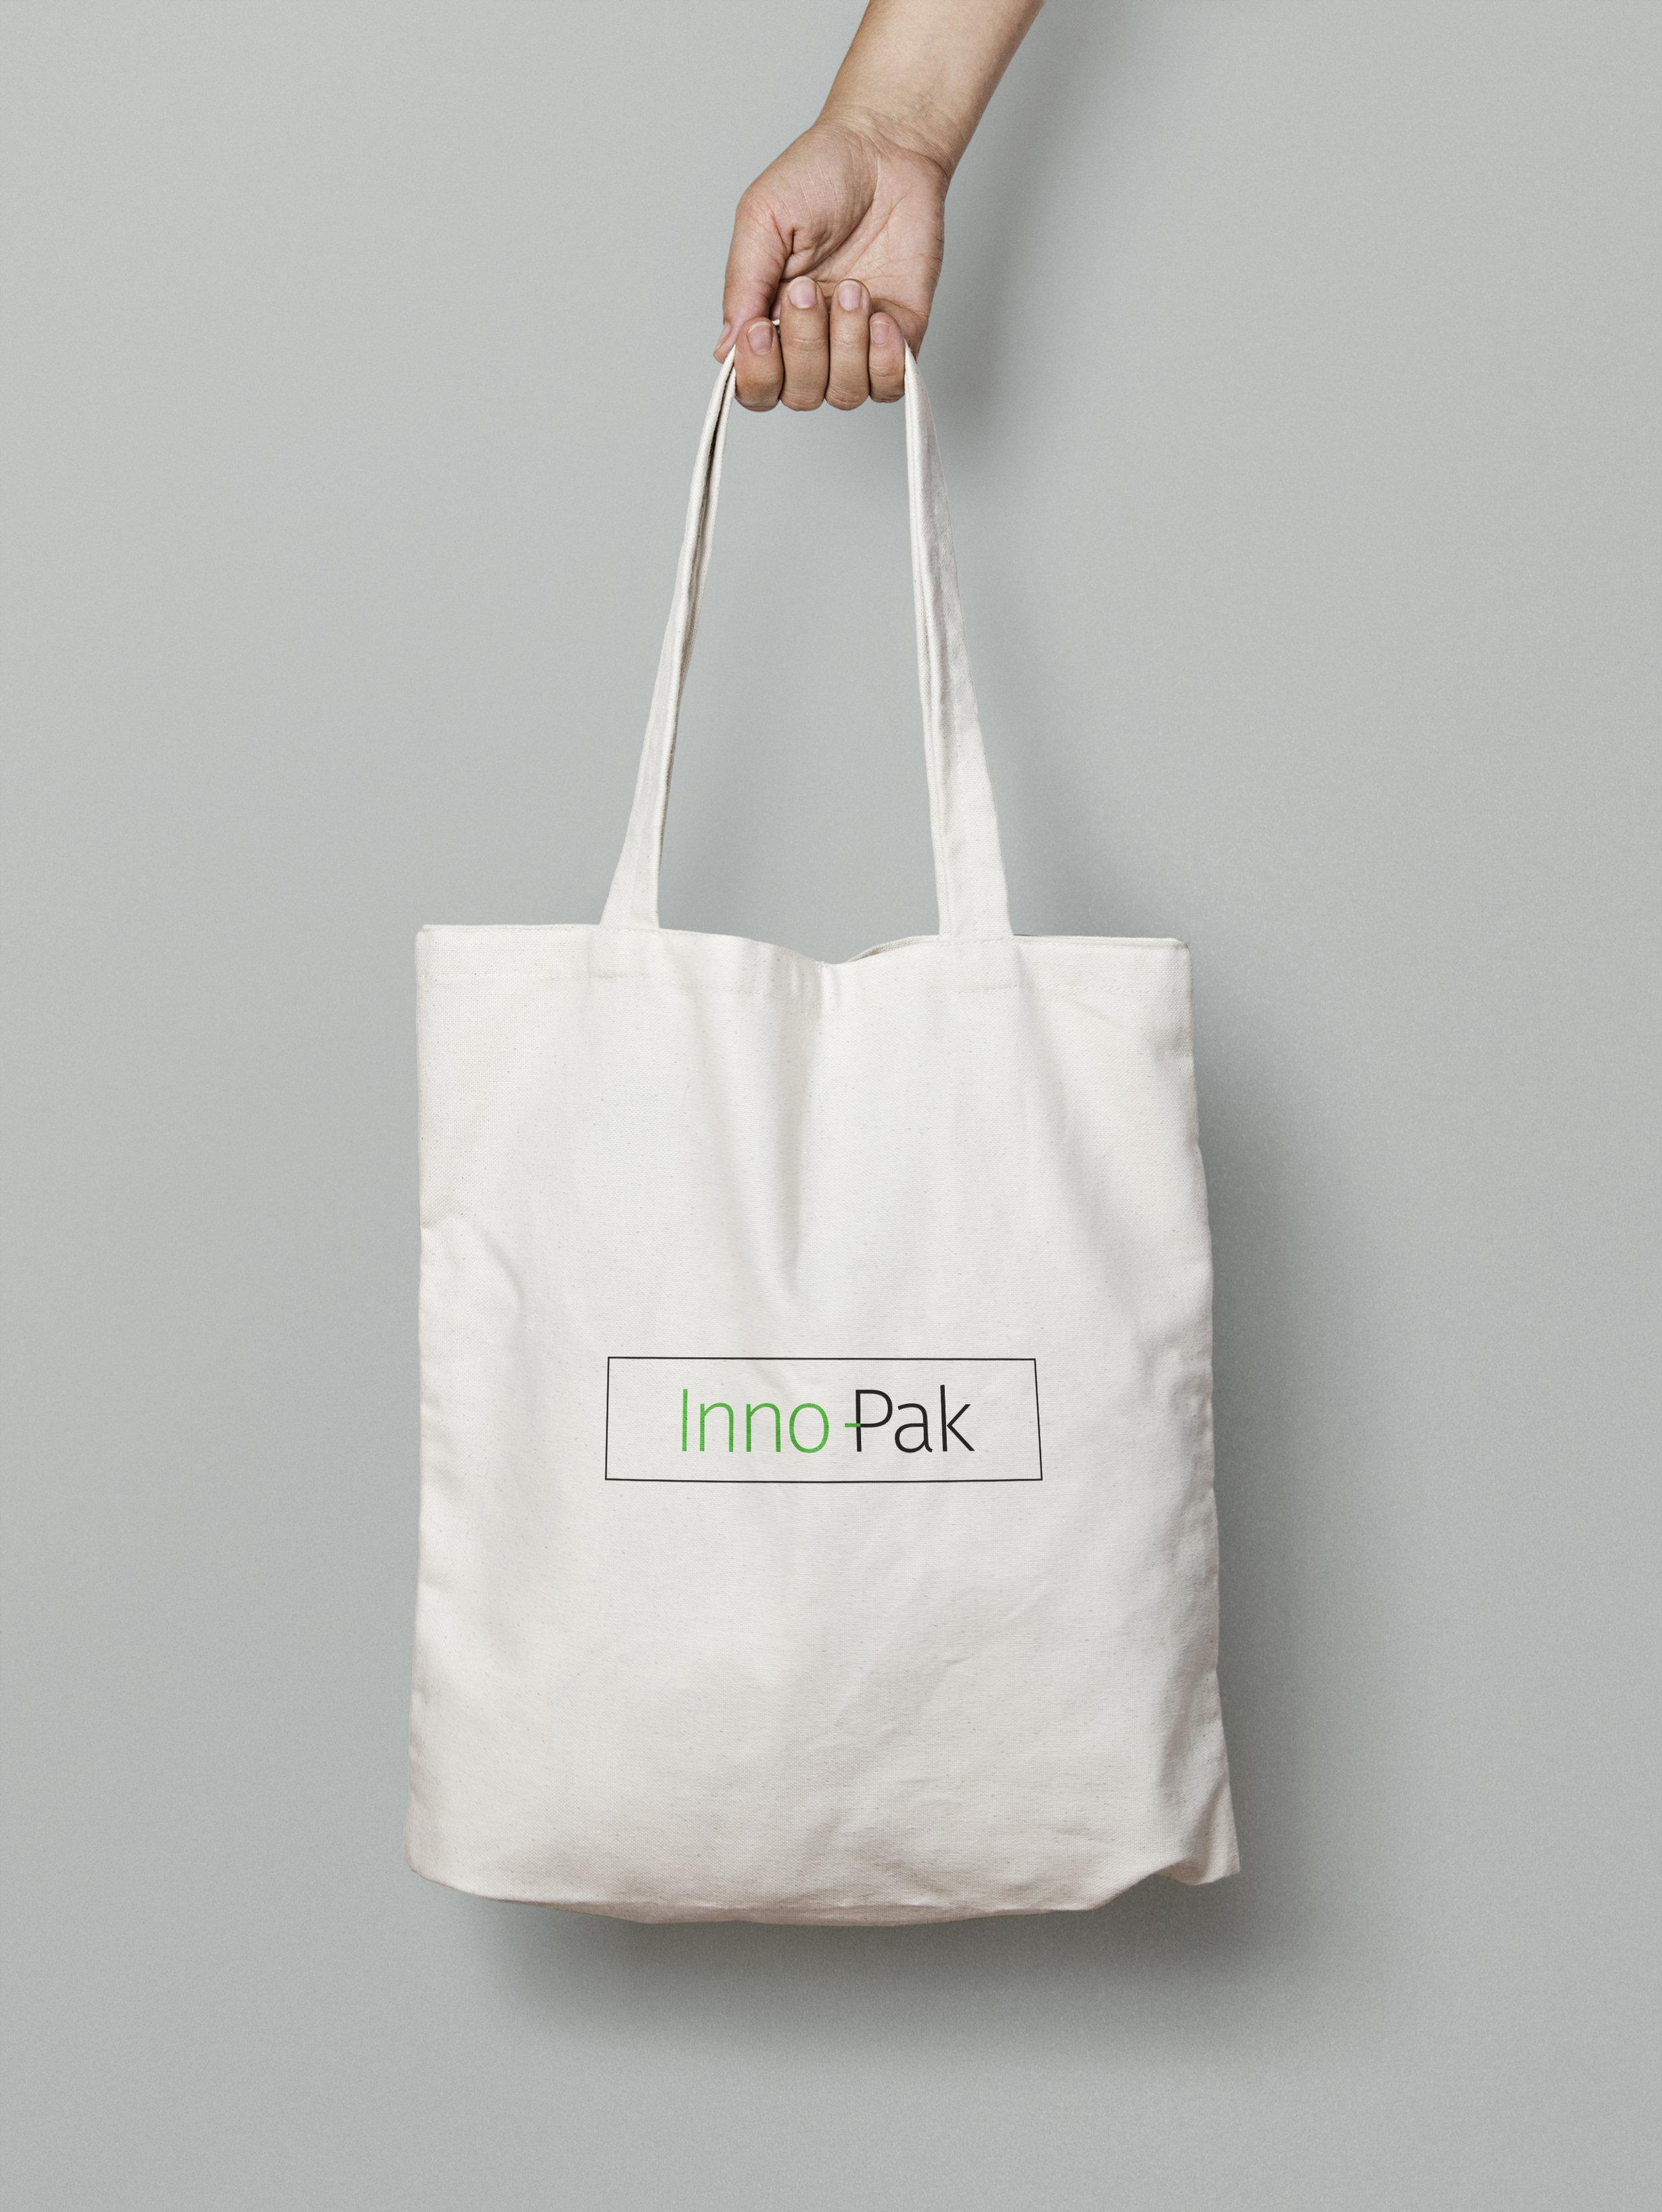 Innopak Canvas Tote Bag MockUp Final.jpg